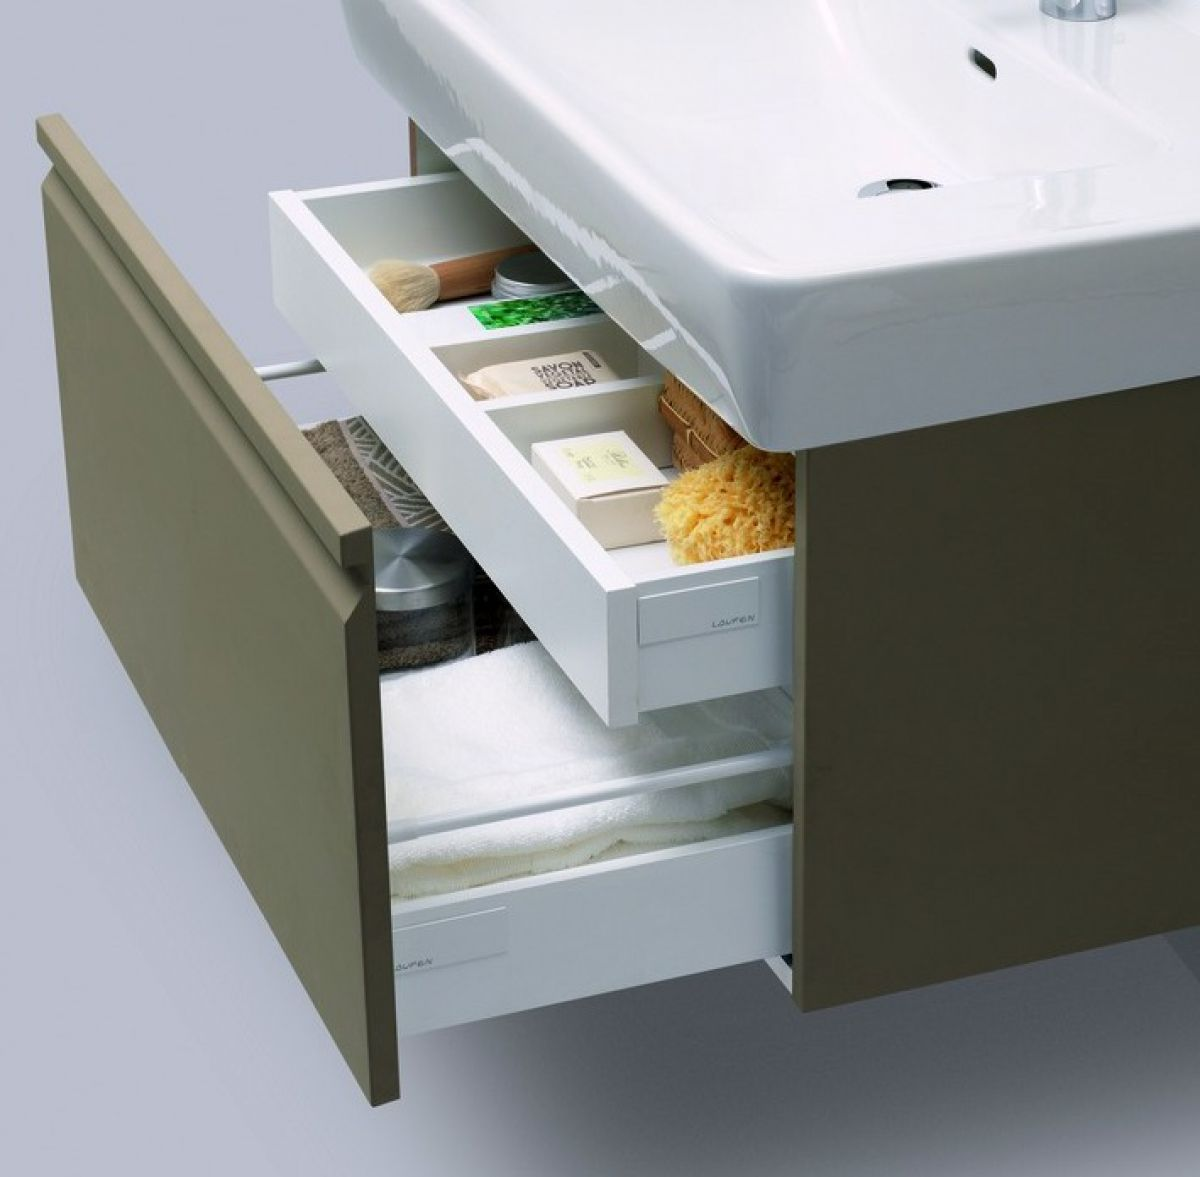 Laufen pro 47cm vanity unit with basin uk bathrooms for Meuble laufen pro s